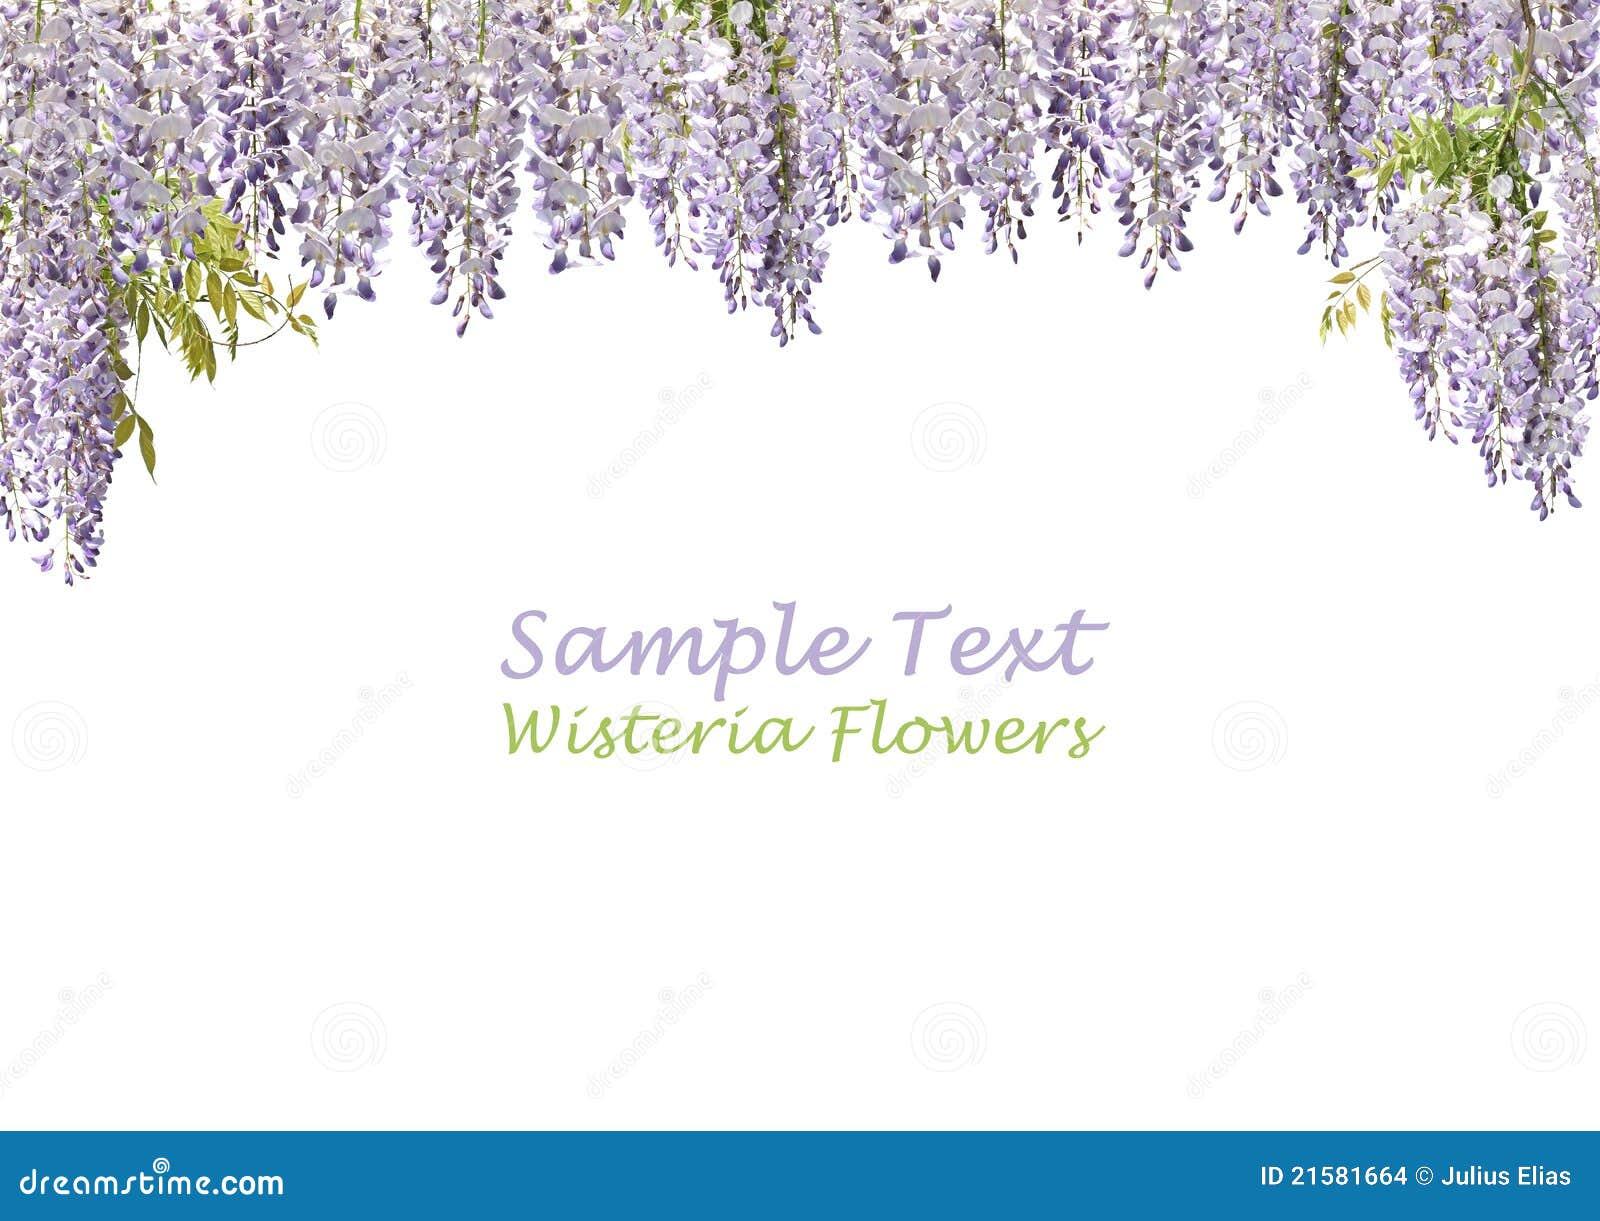 Two Wisteria Flowers